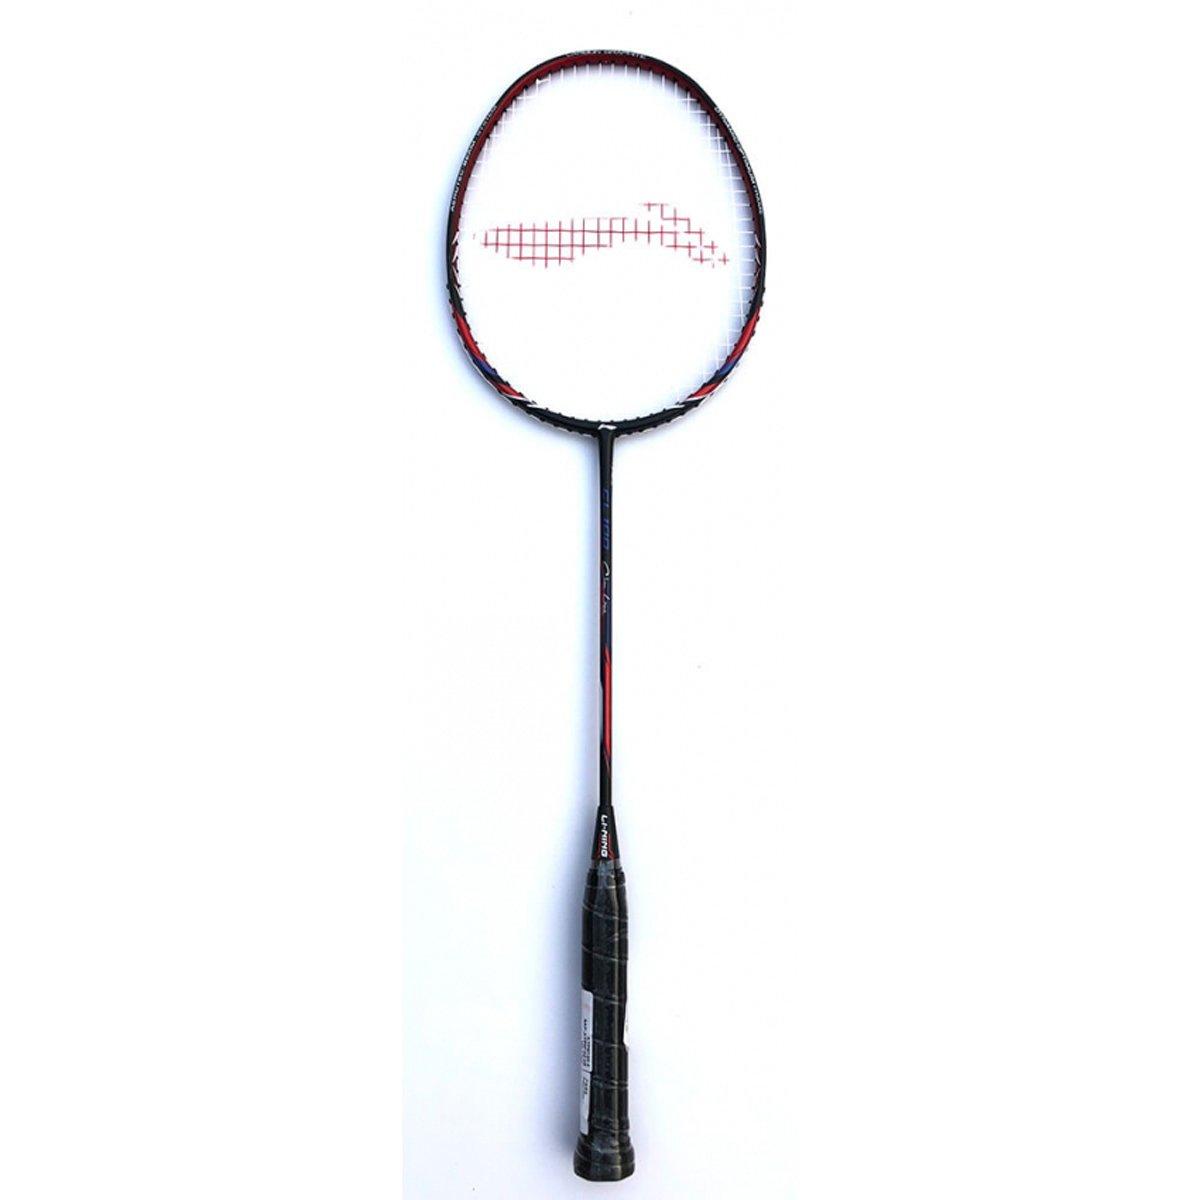 e432be14b Li-Ning CL-100 Graphite Chen Long Series High-Tension Badminton Racquet  product